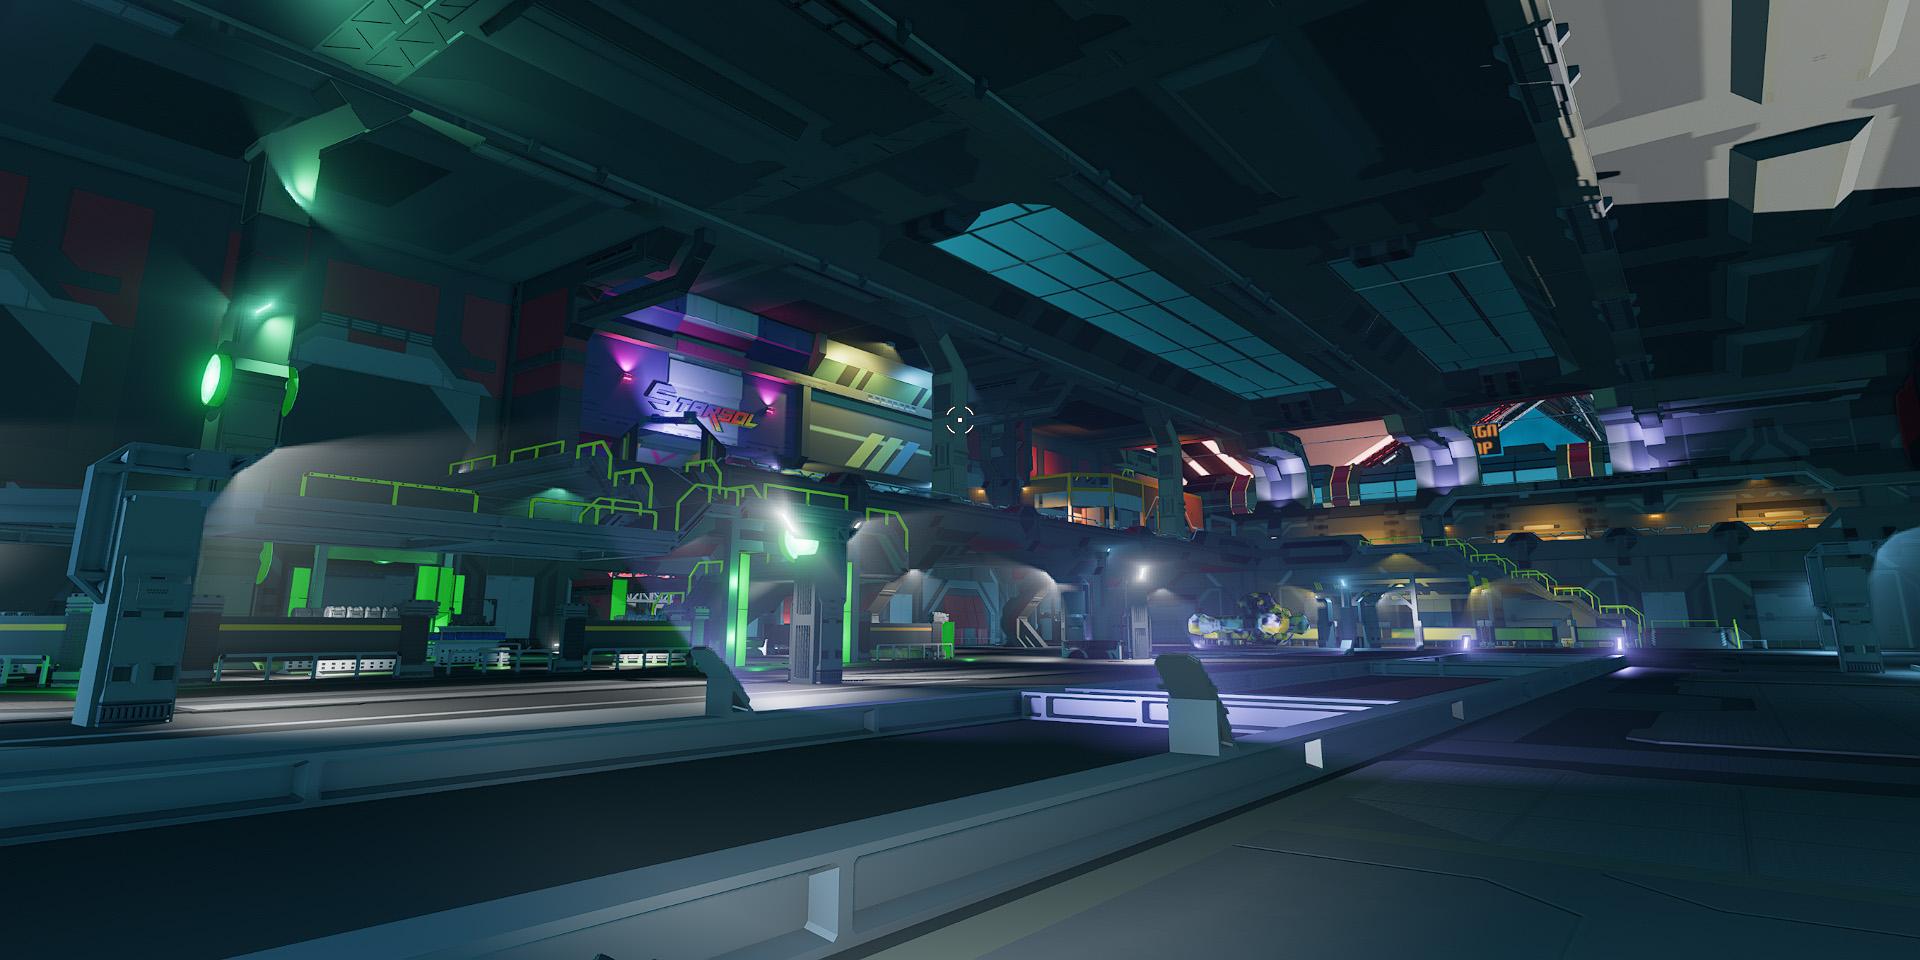 Starbase: Проблема общего склада